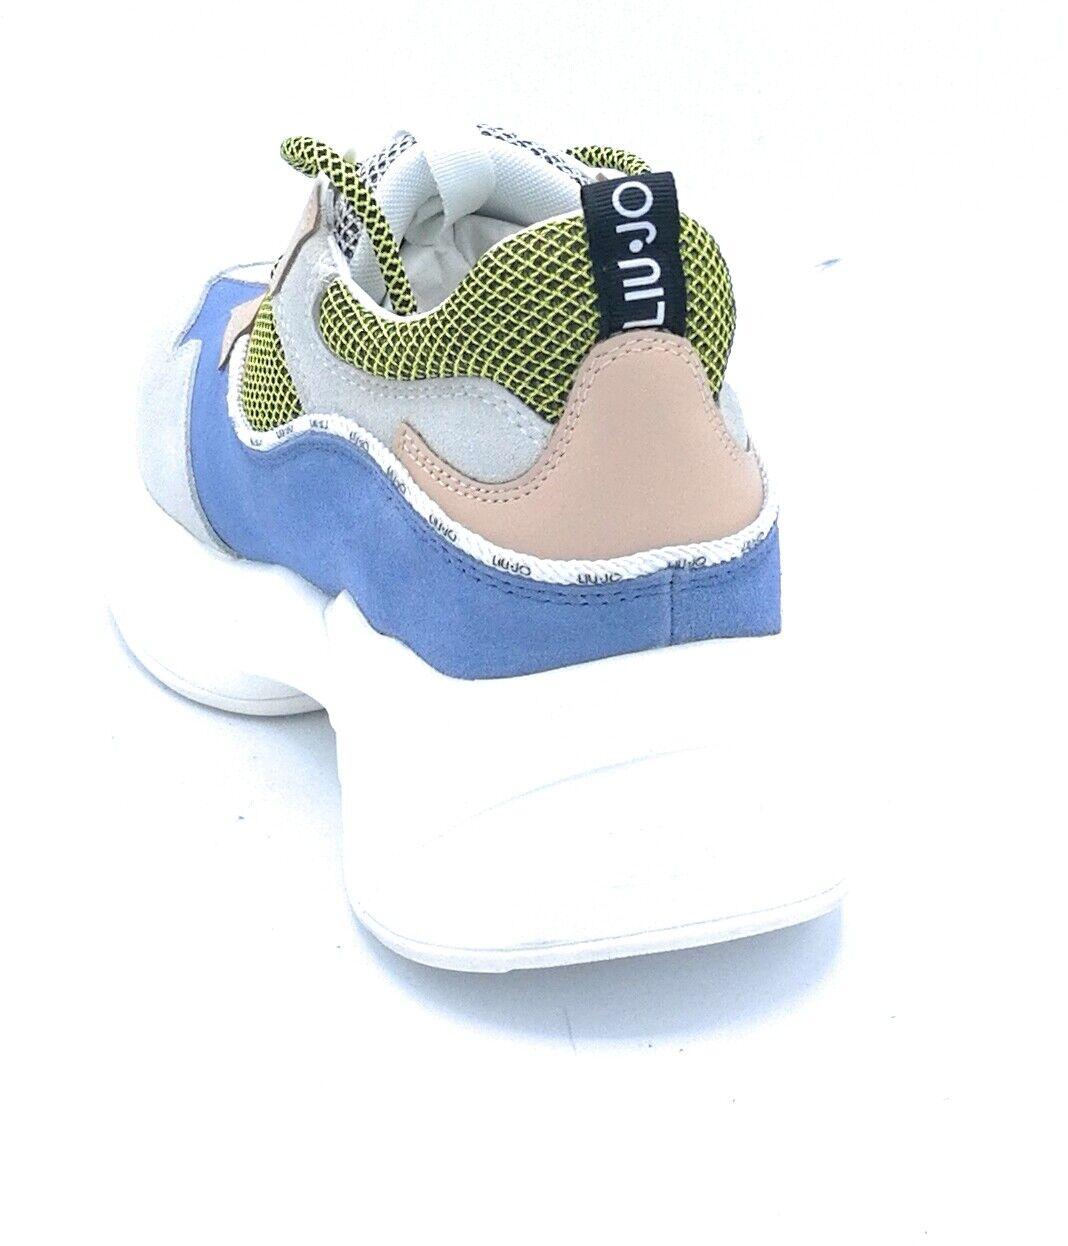 Liu Jo B19035 Sportschuhe Schnürsenkel Gämse Mehrfarben    c06ded